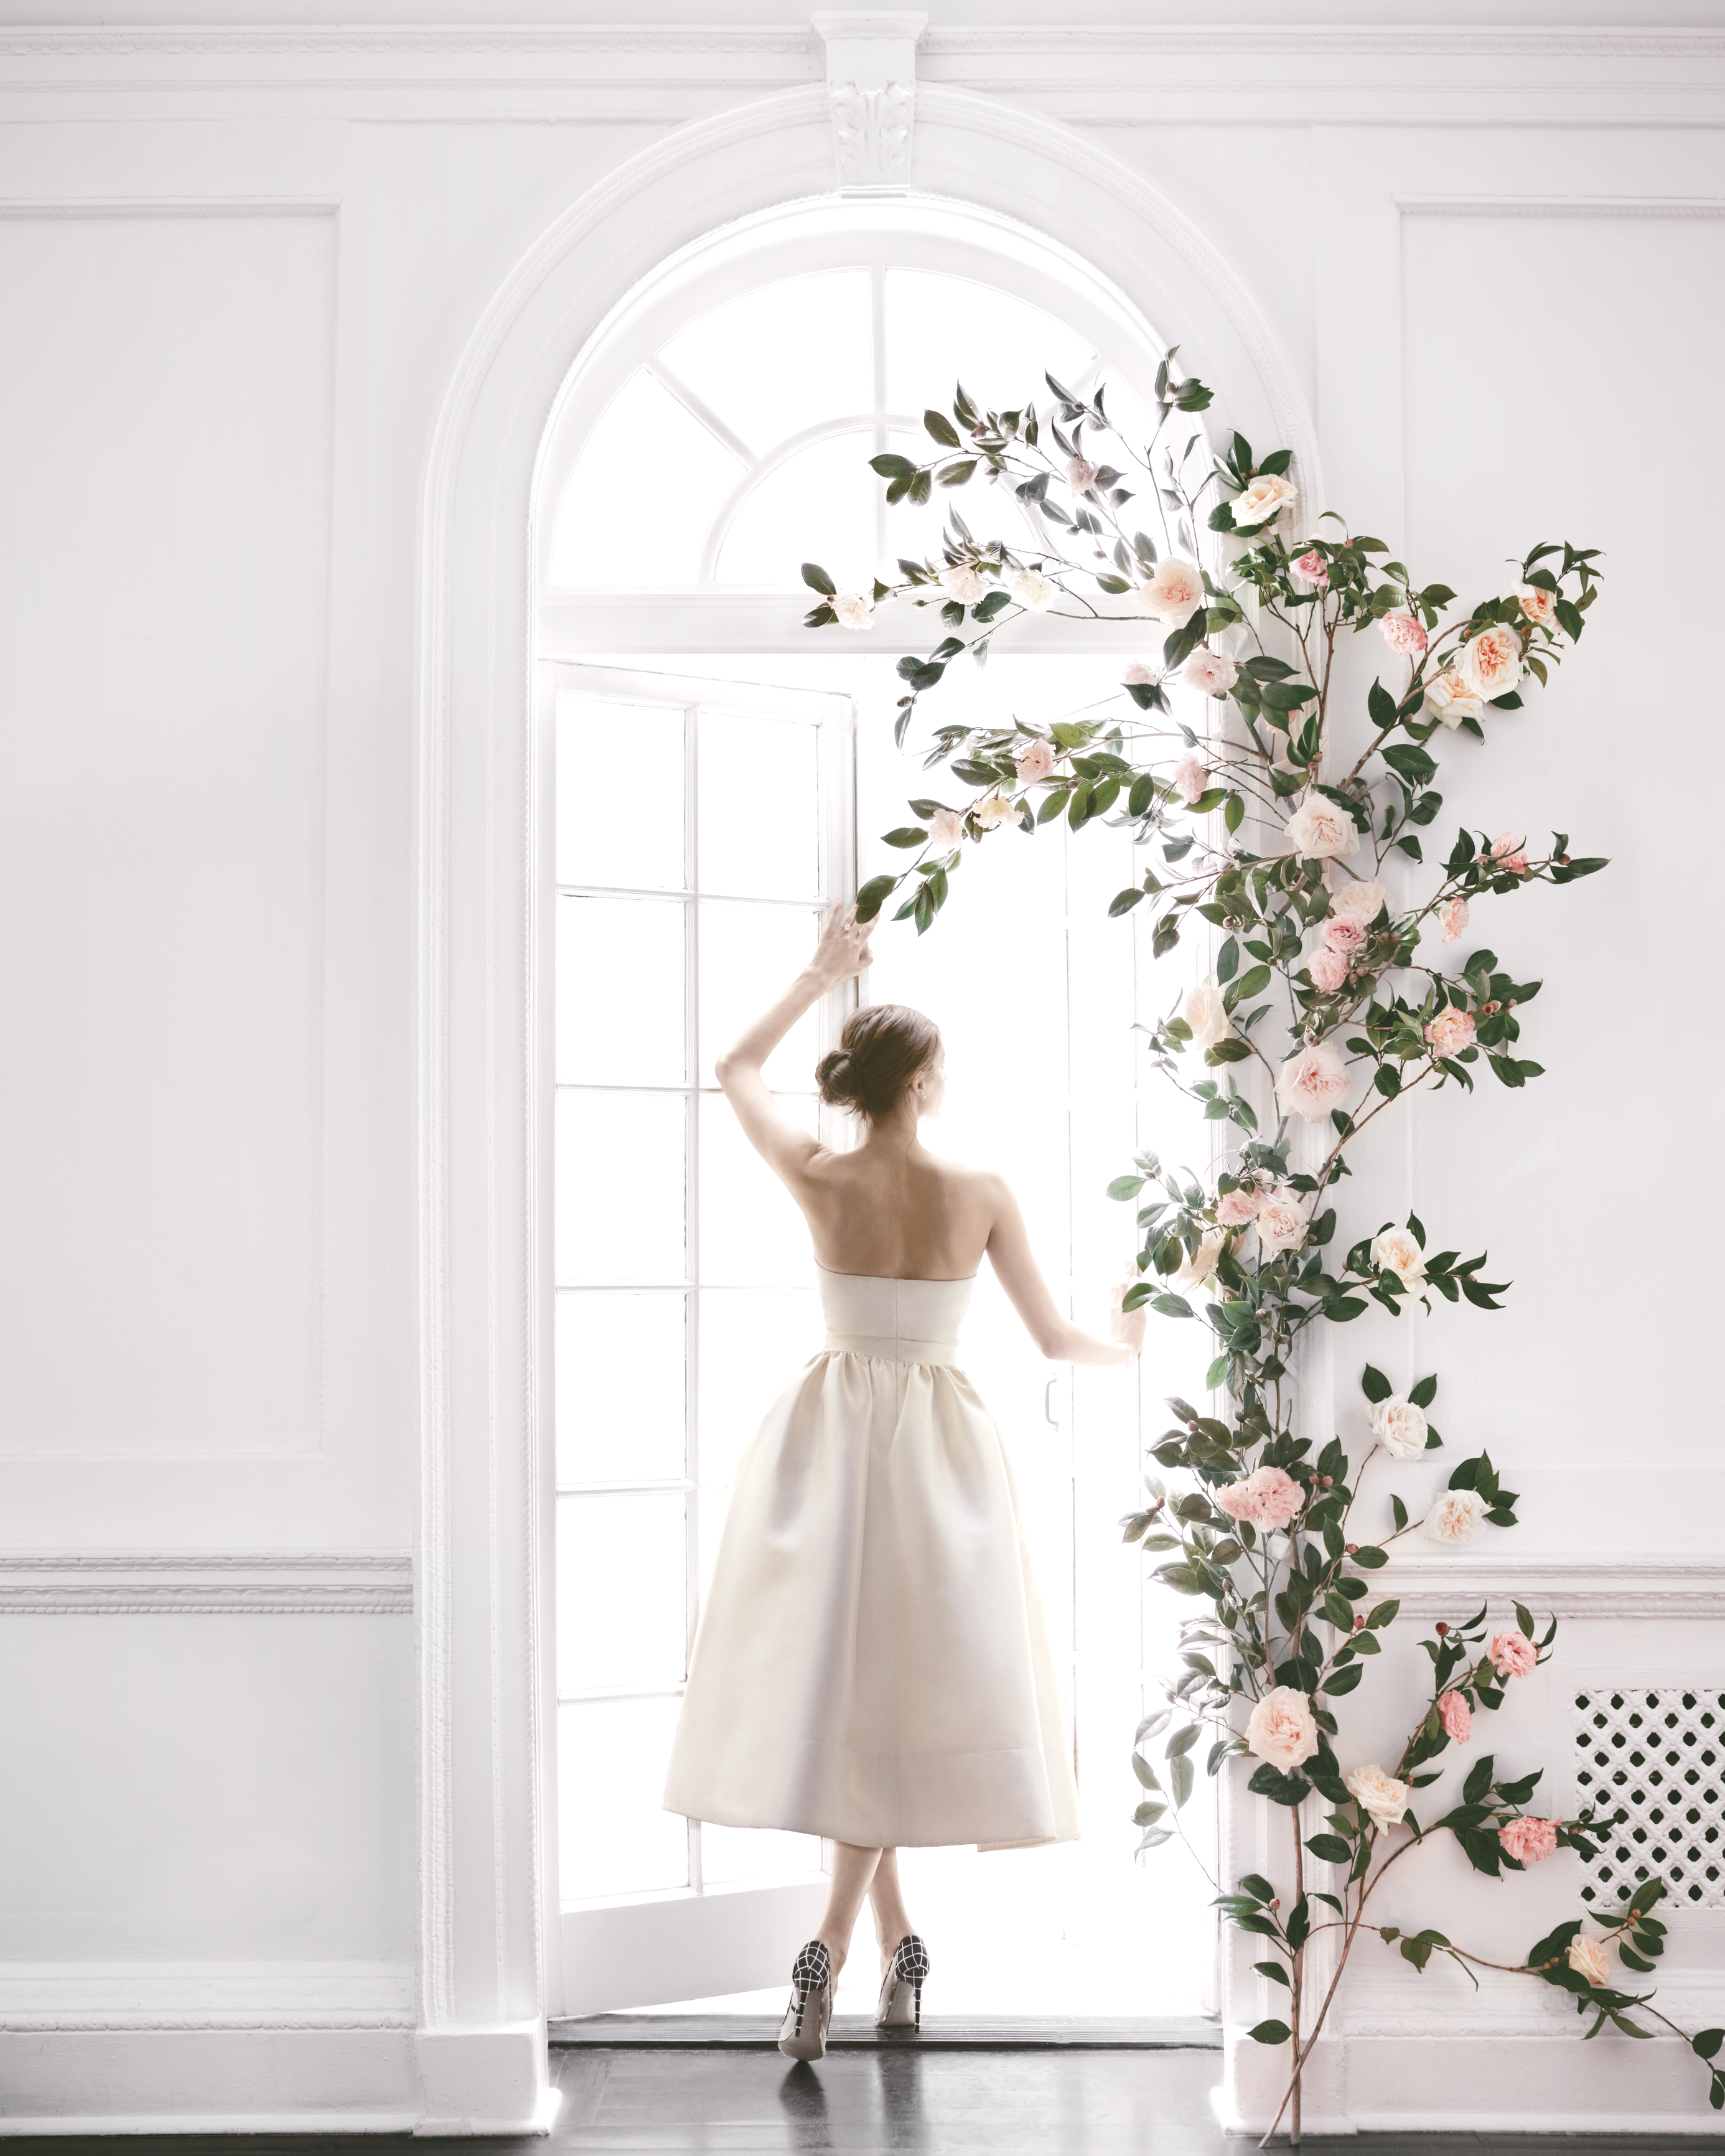 flowers-doorway-shot-3-0209-d111961.jpg